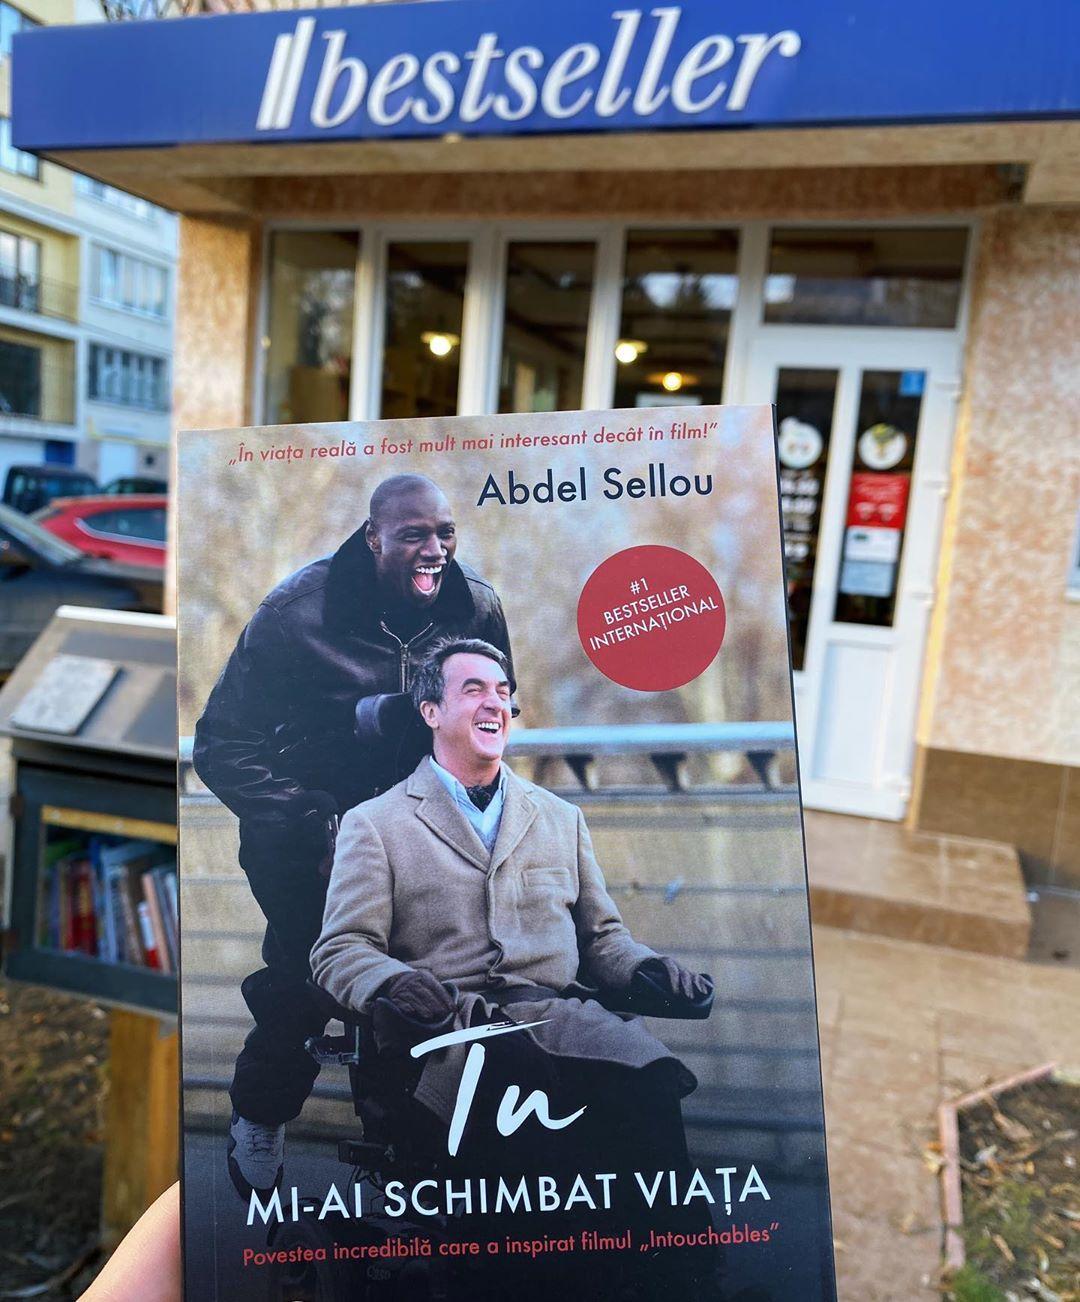 Tu mi-ai schimbat viața de Abdell Sellou Editura Bestseller